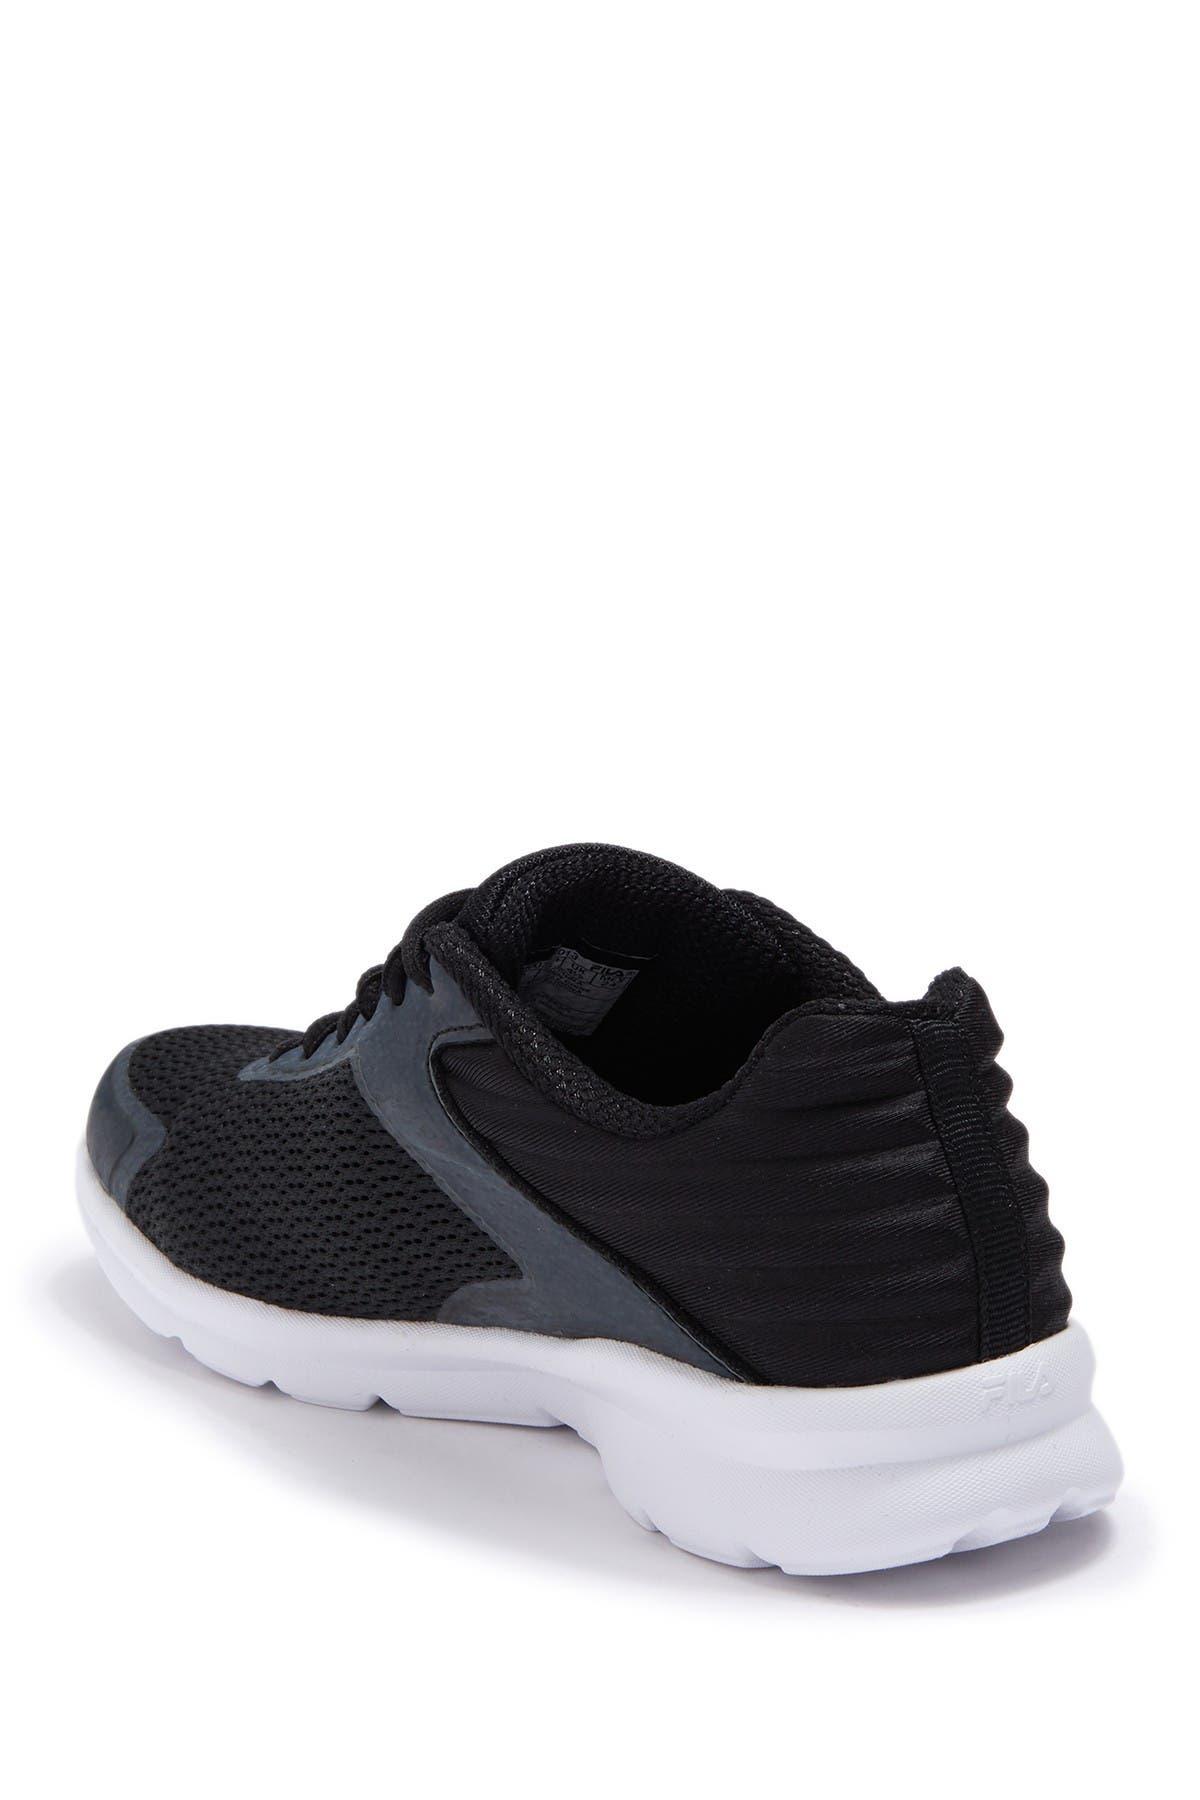 Image of FILA USA Memory Fraction 5 Running Shoe